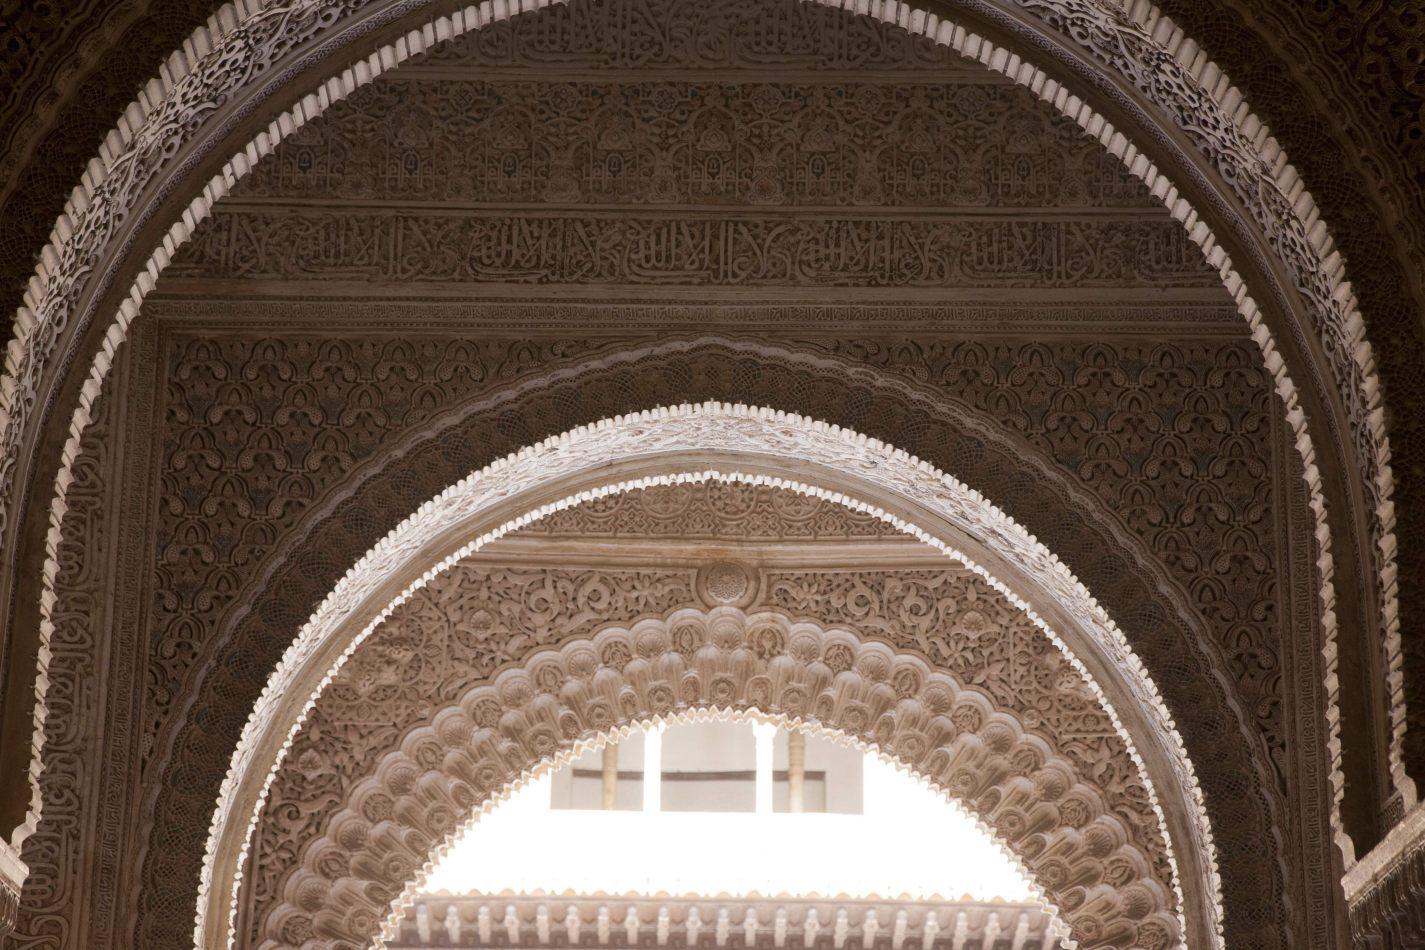 Anthony Ellis Photography: Around the Edges - Arabesque Arches